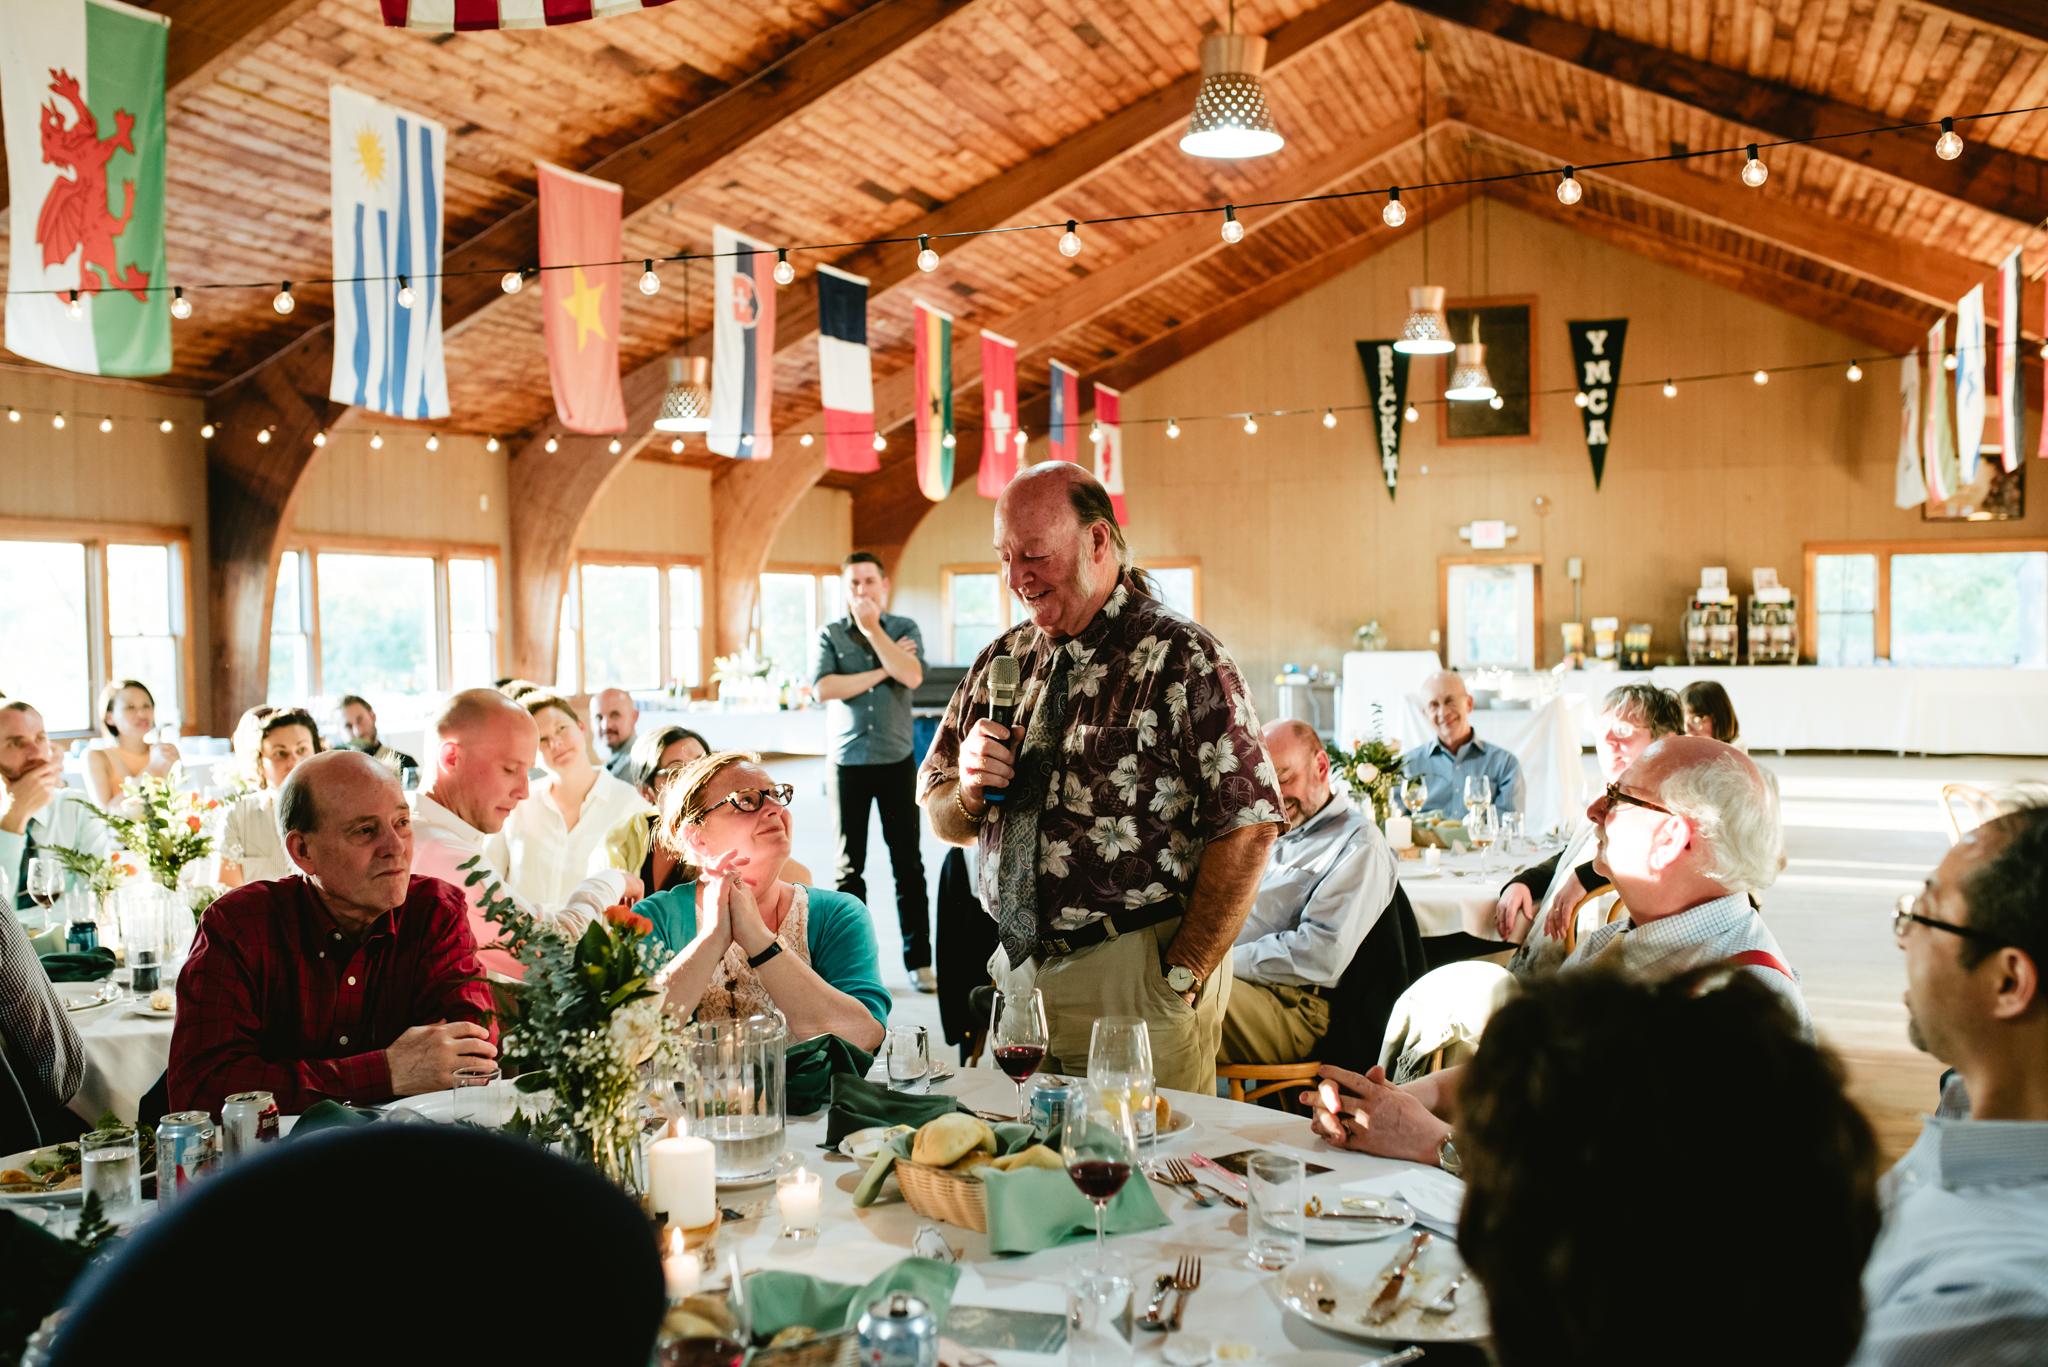 Summer Camp Wedding Photography June 2017 Massachusetts Berkshires Outdoor Wedding Photography Novella Photography Matt and Paulette Griswold (144).jpg